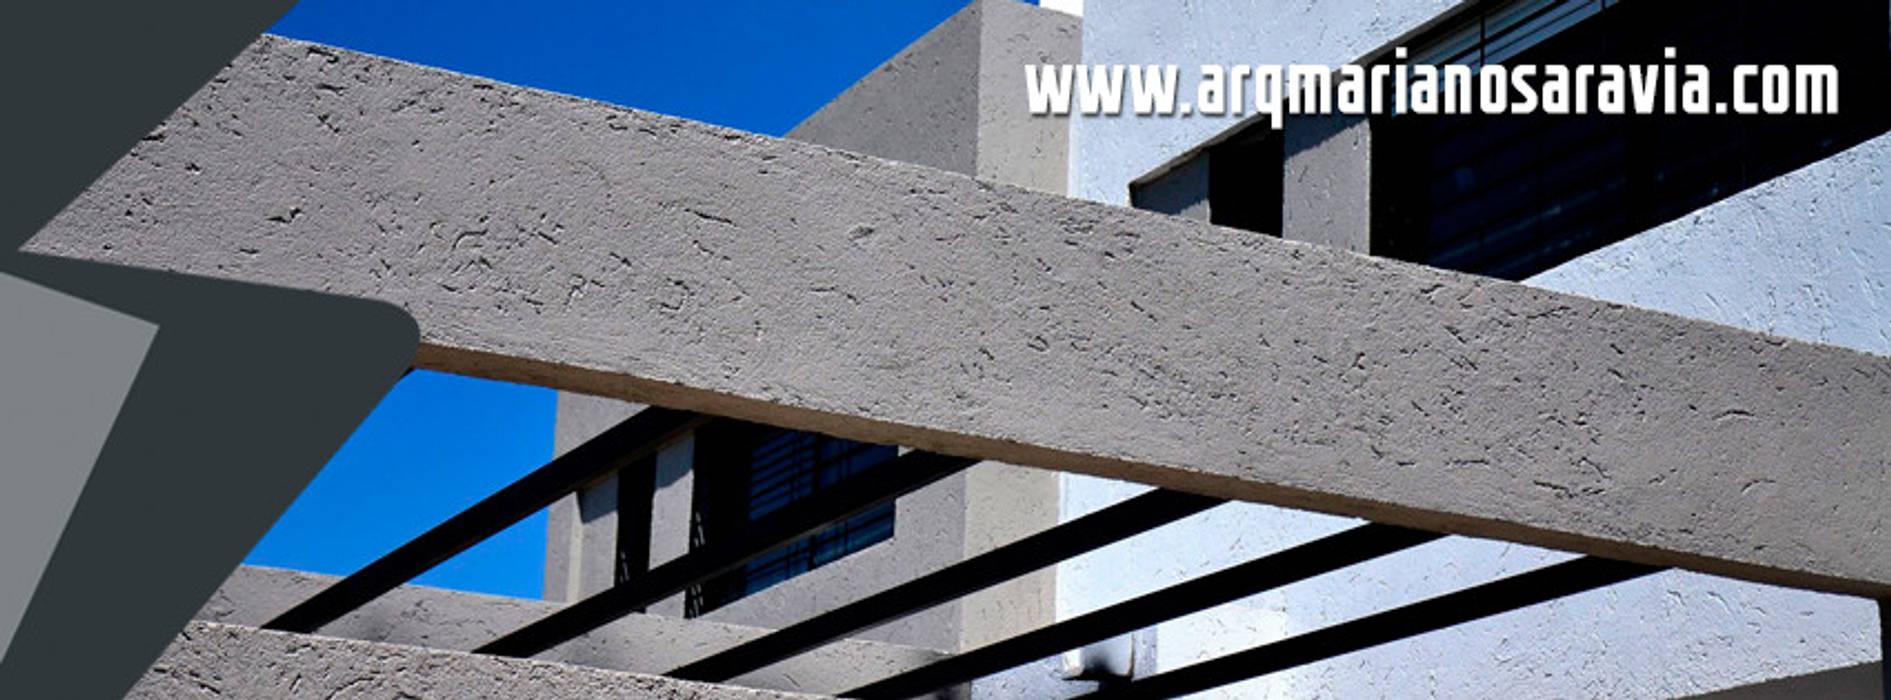 Proyectos de Arq. Mariano Saravia